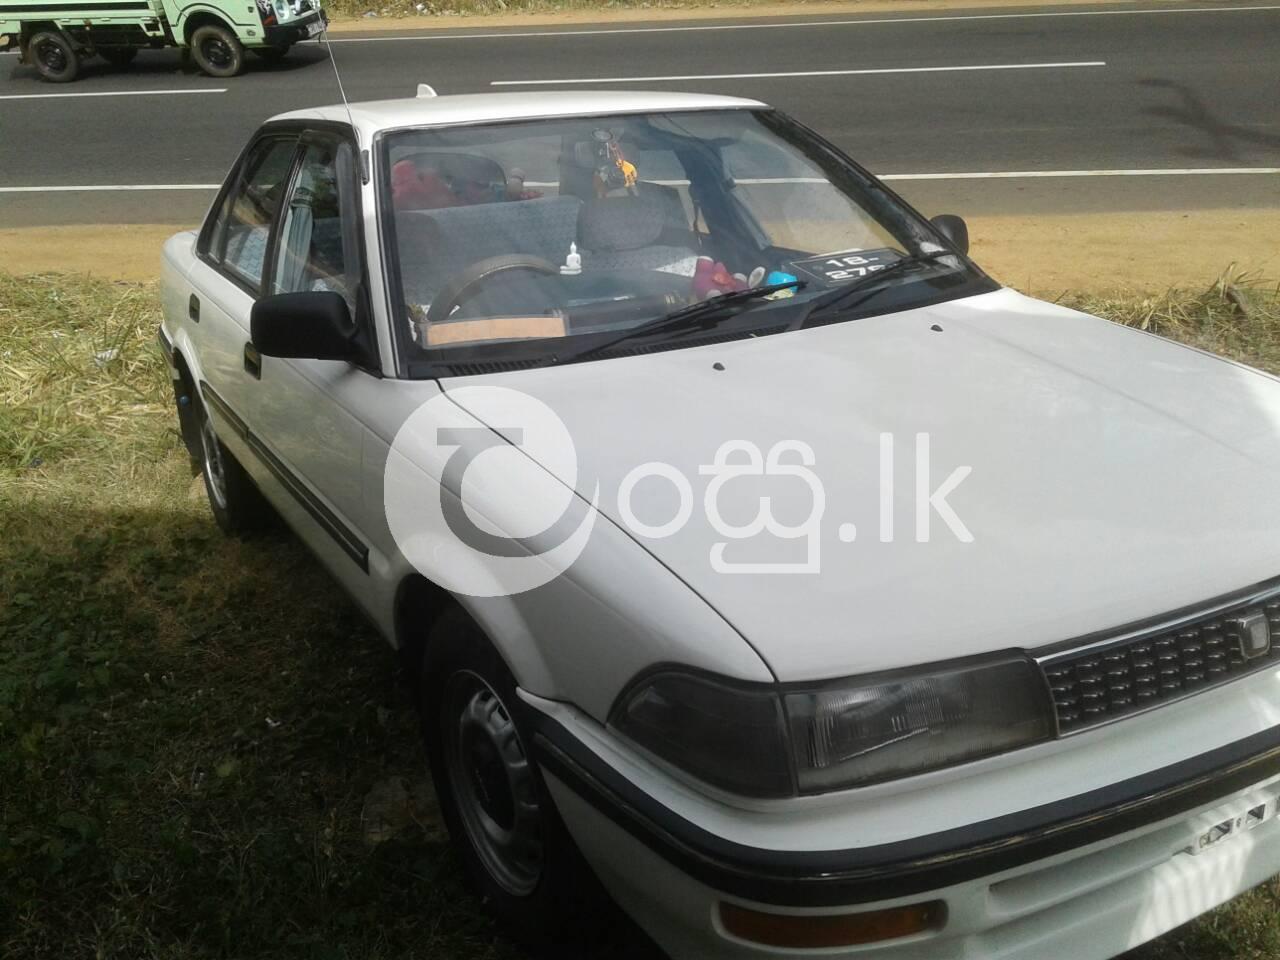 Toyota Corolla EE90 in Galewela